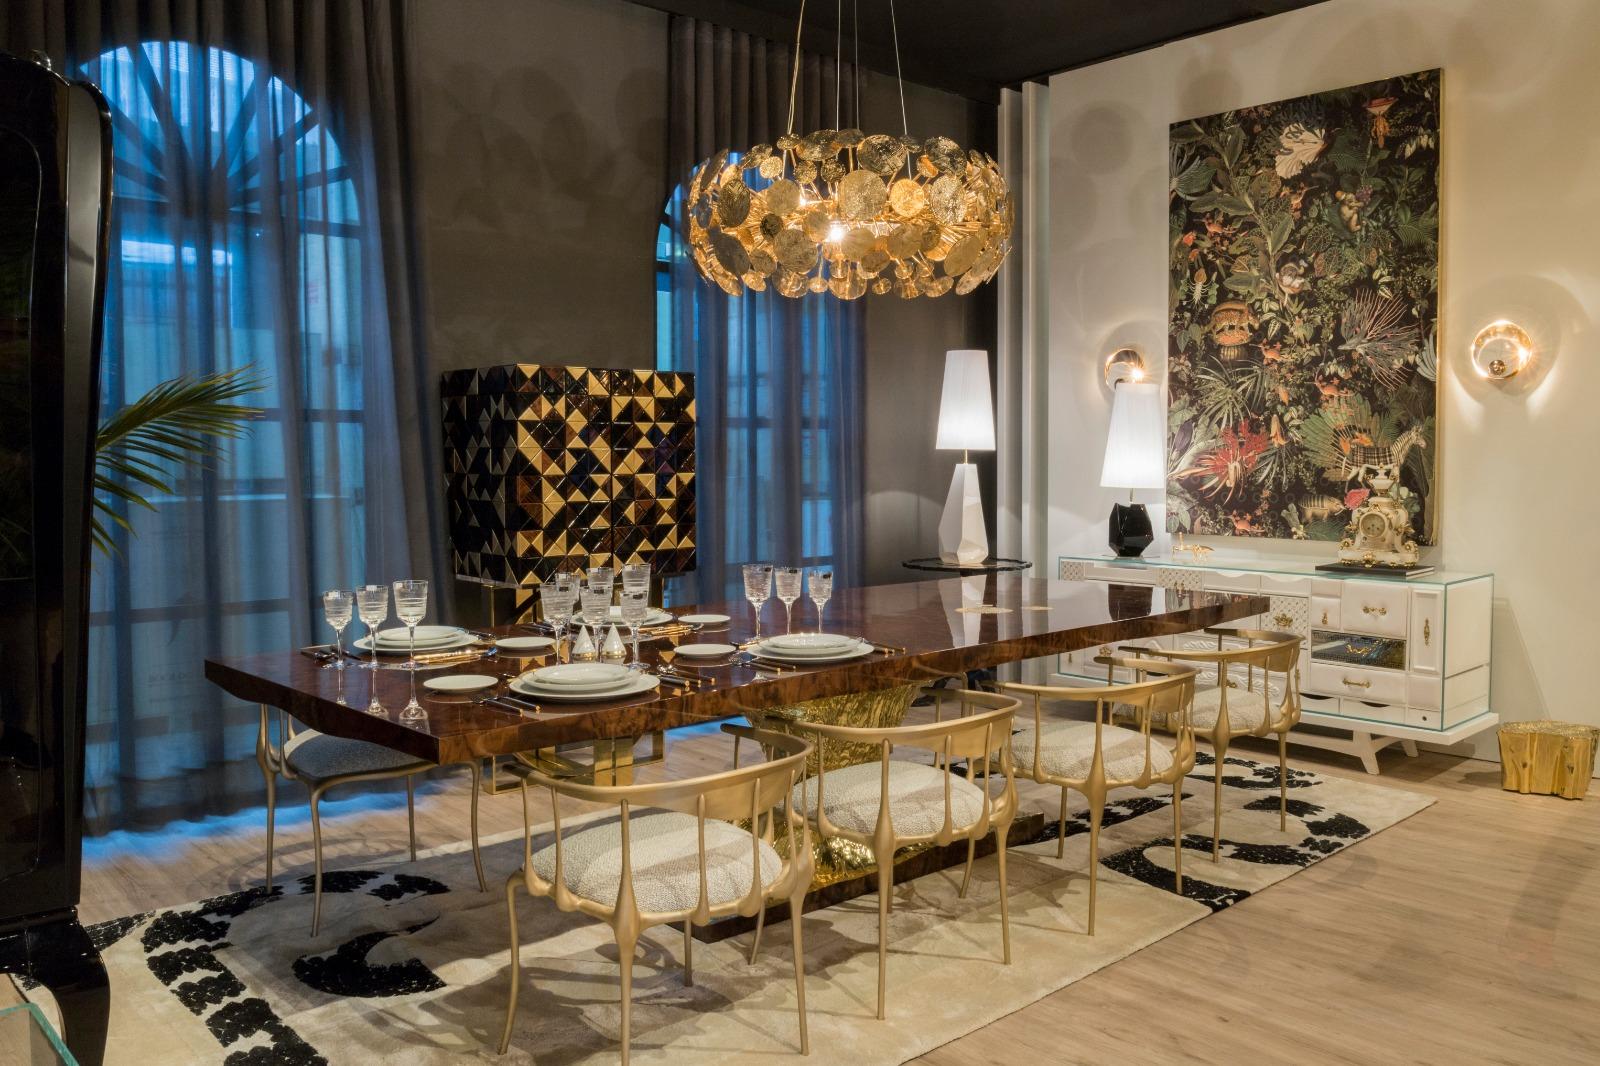 Boca-do-Lobo-RugSociety-Luxxu_Dining-room_Maison-et-Objet